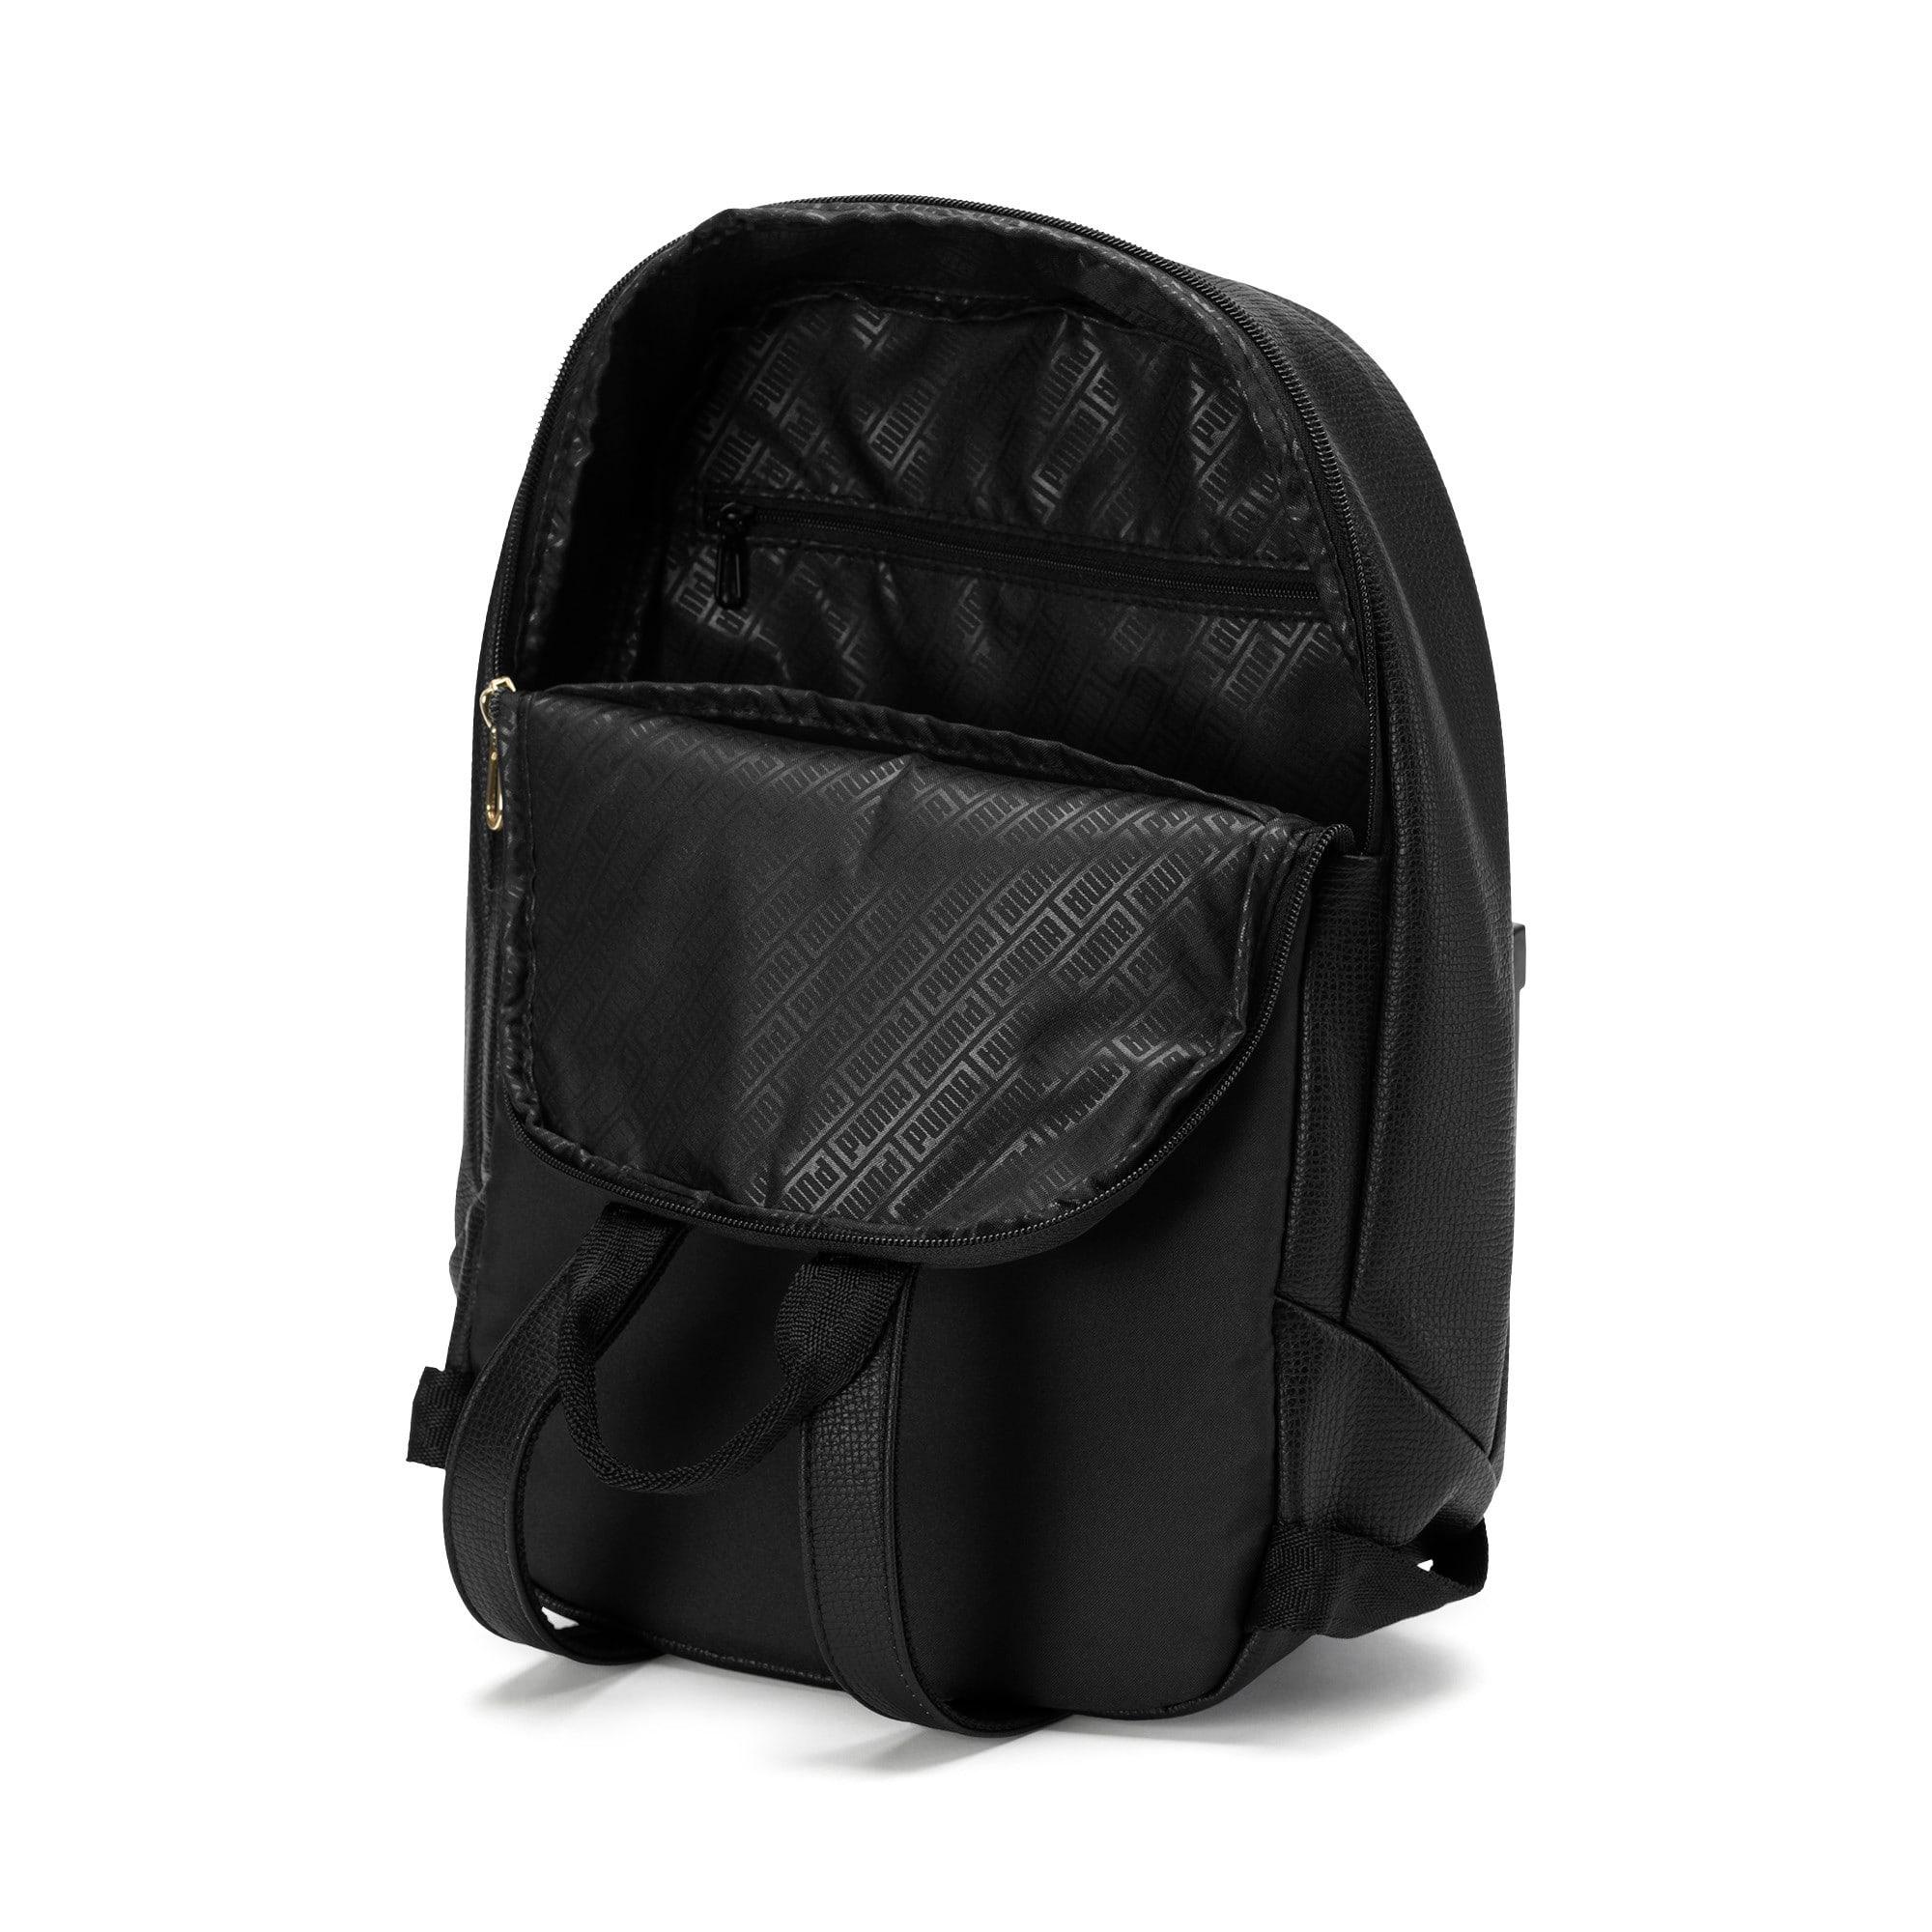 Thumbnail 5 of Ferrari Lifestyle Zainetto Backpack, Puma Black, medium